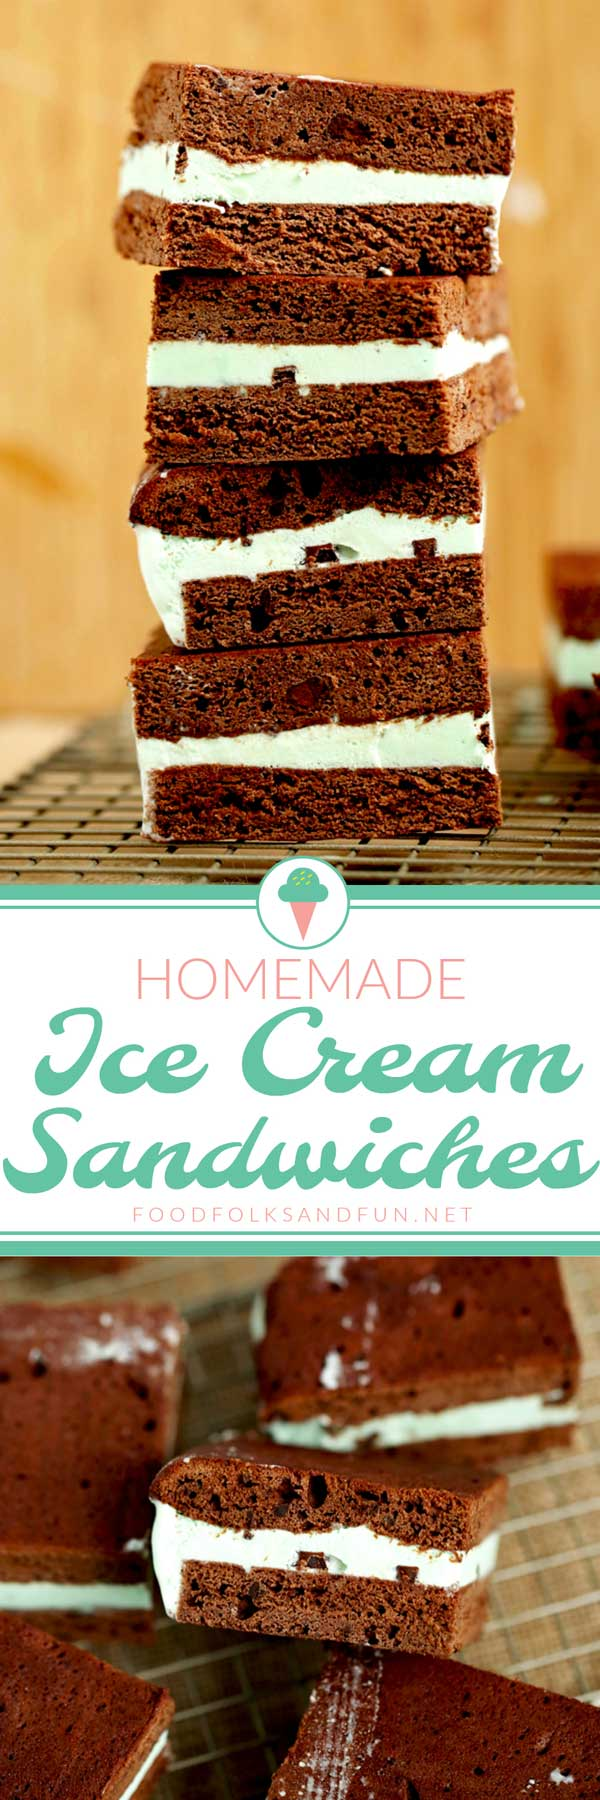 Homemade Ice Cream Sandwiches via @foodfolksandfun